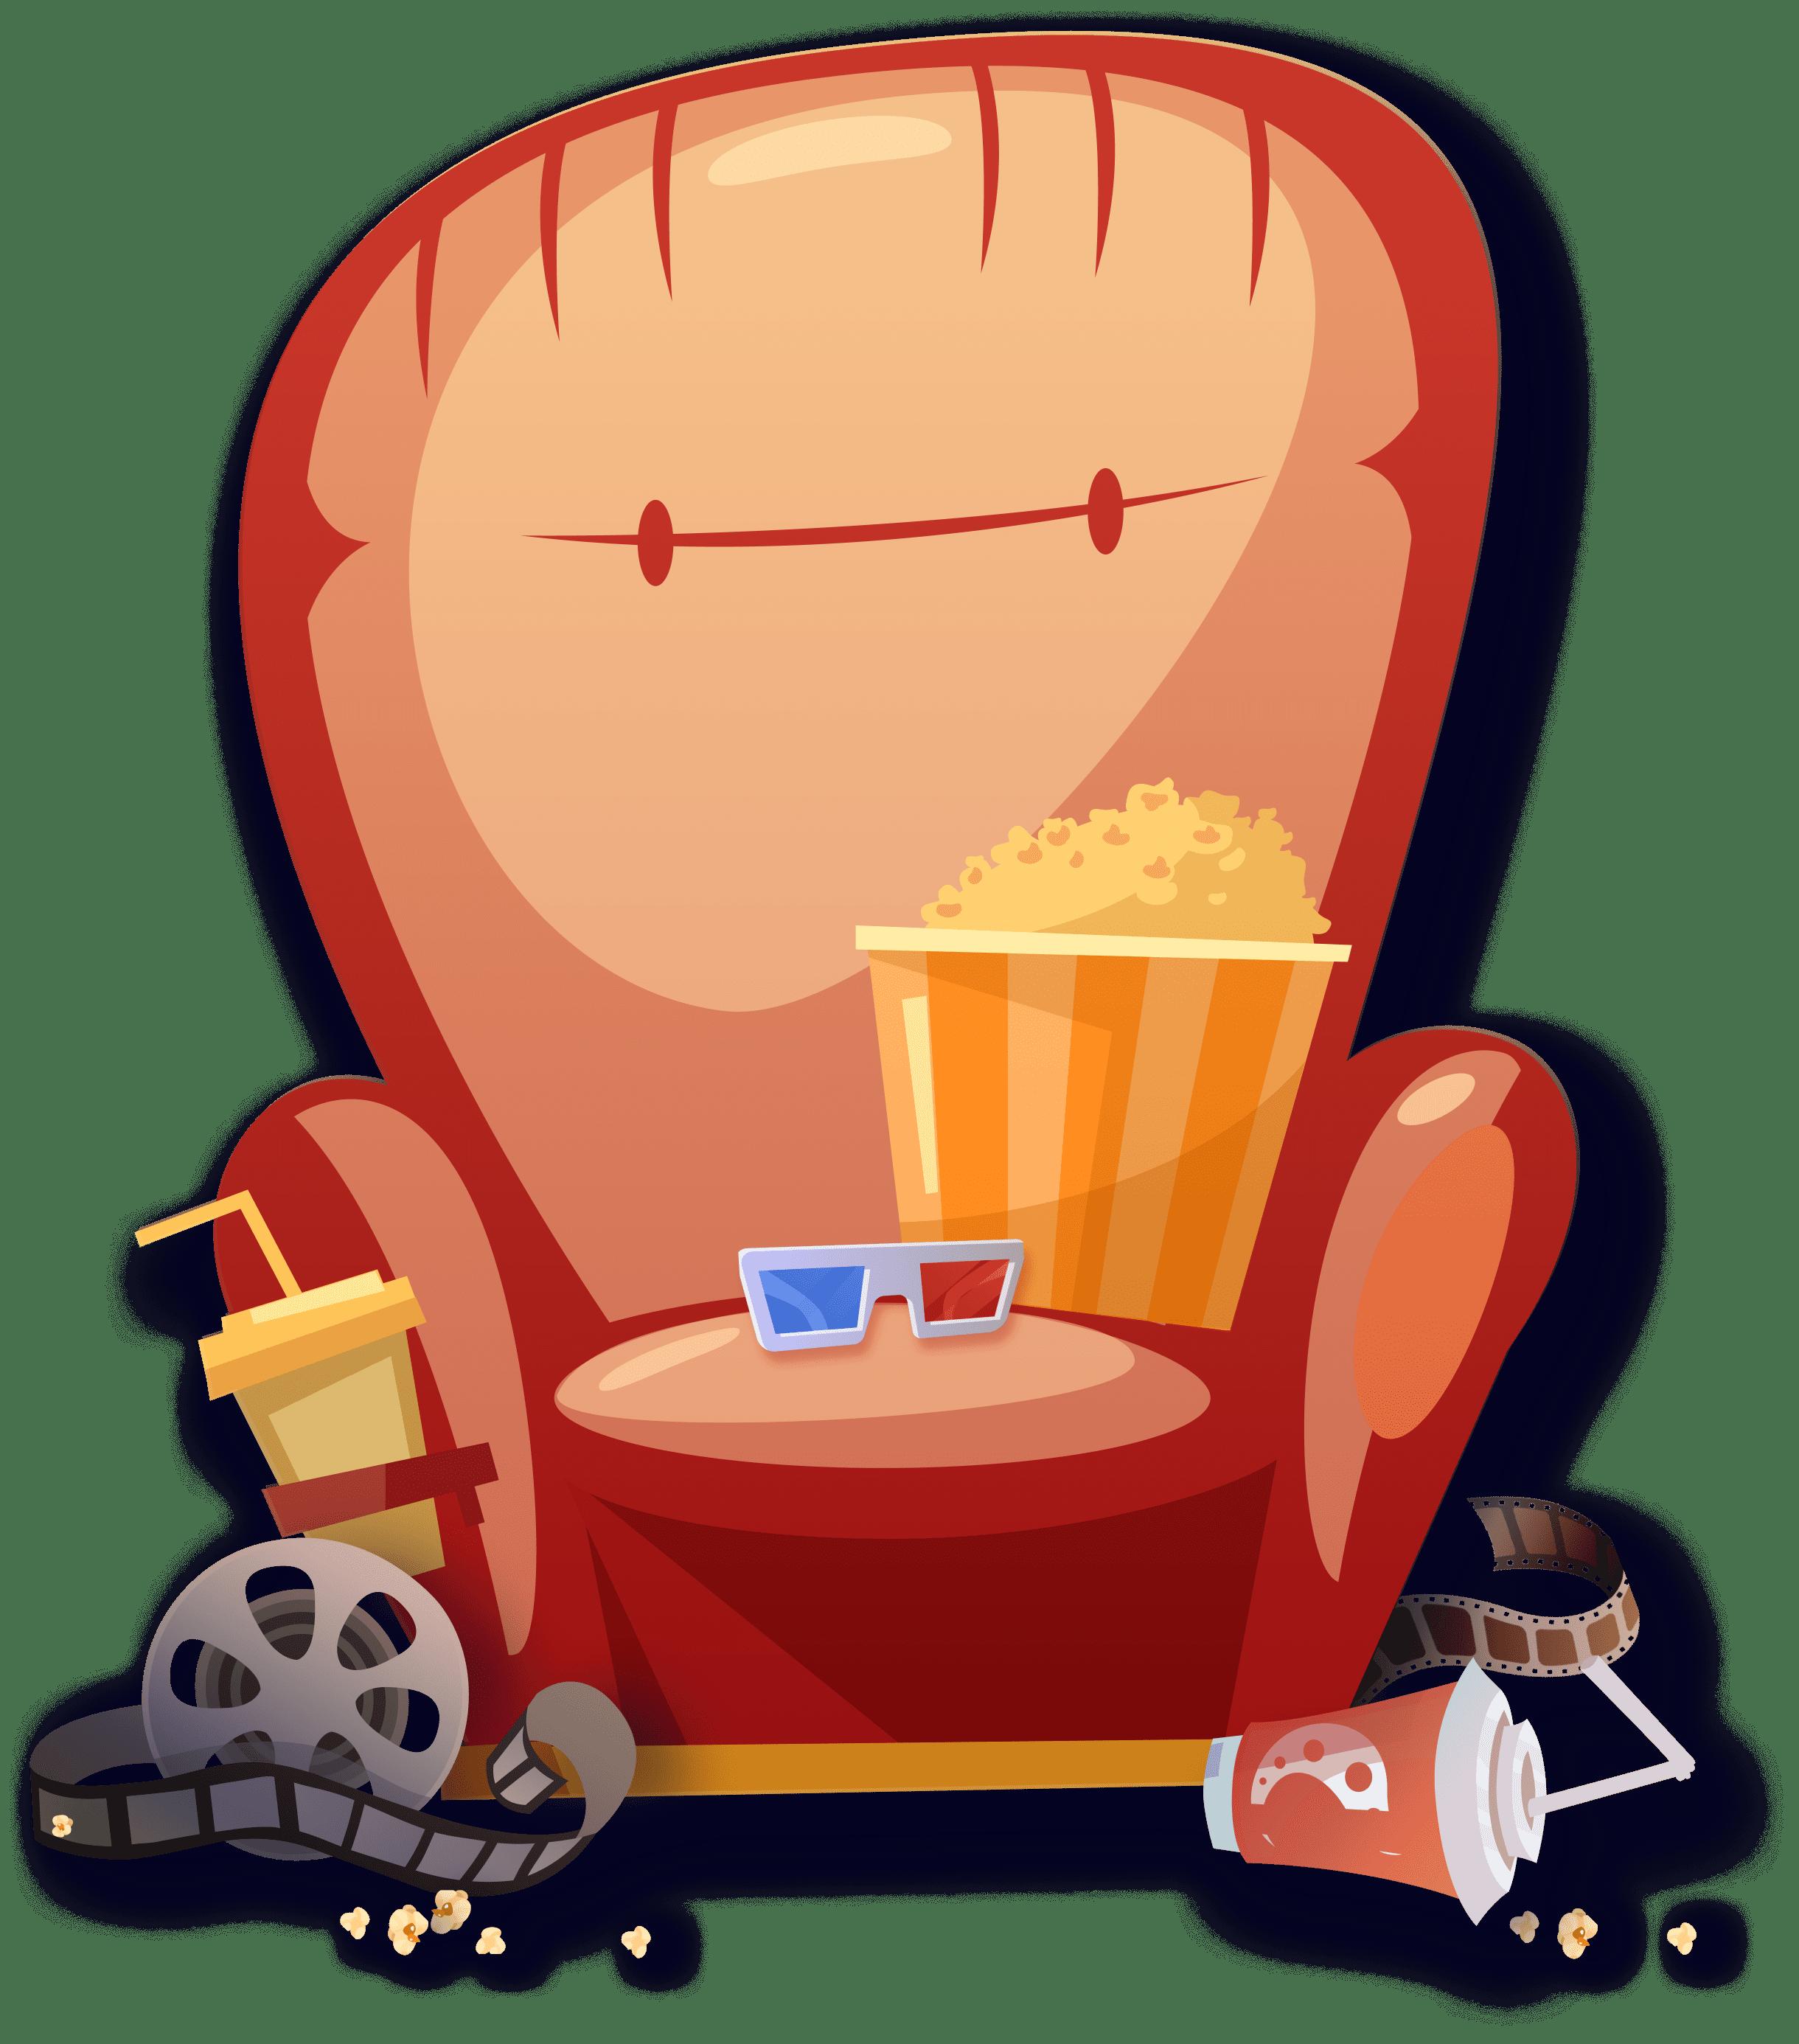 Стул кинотеатра